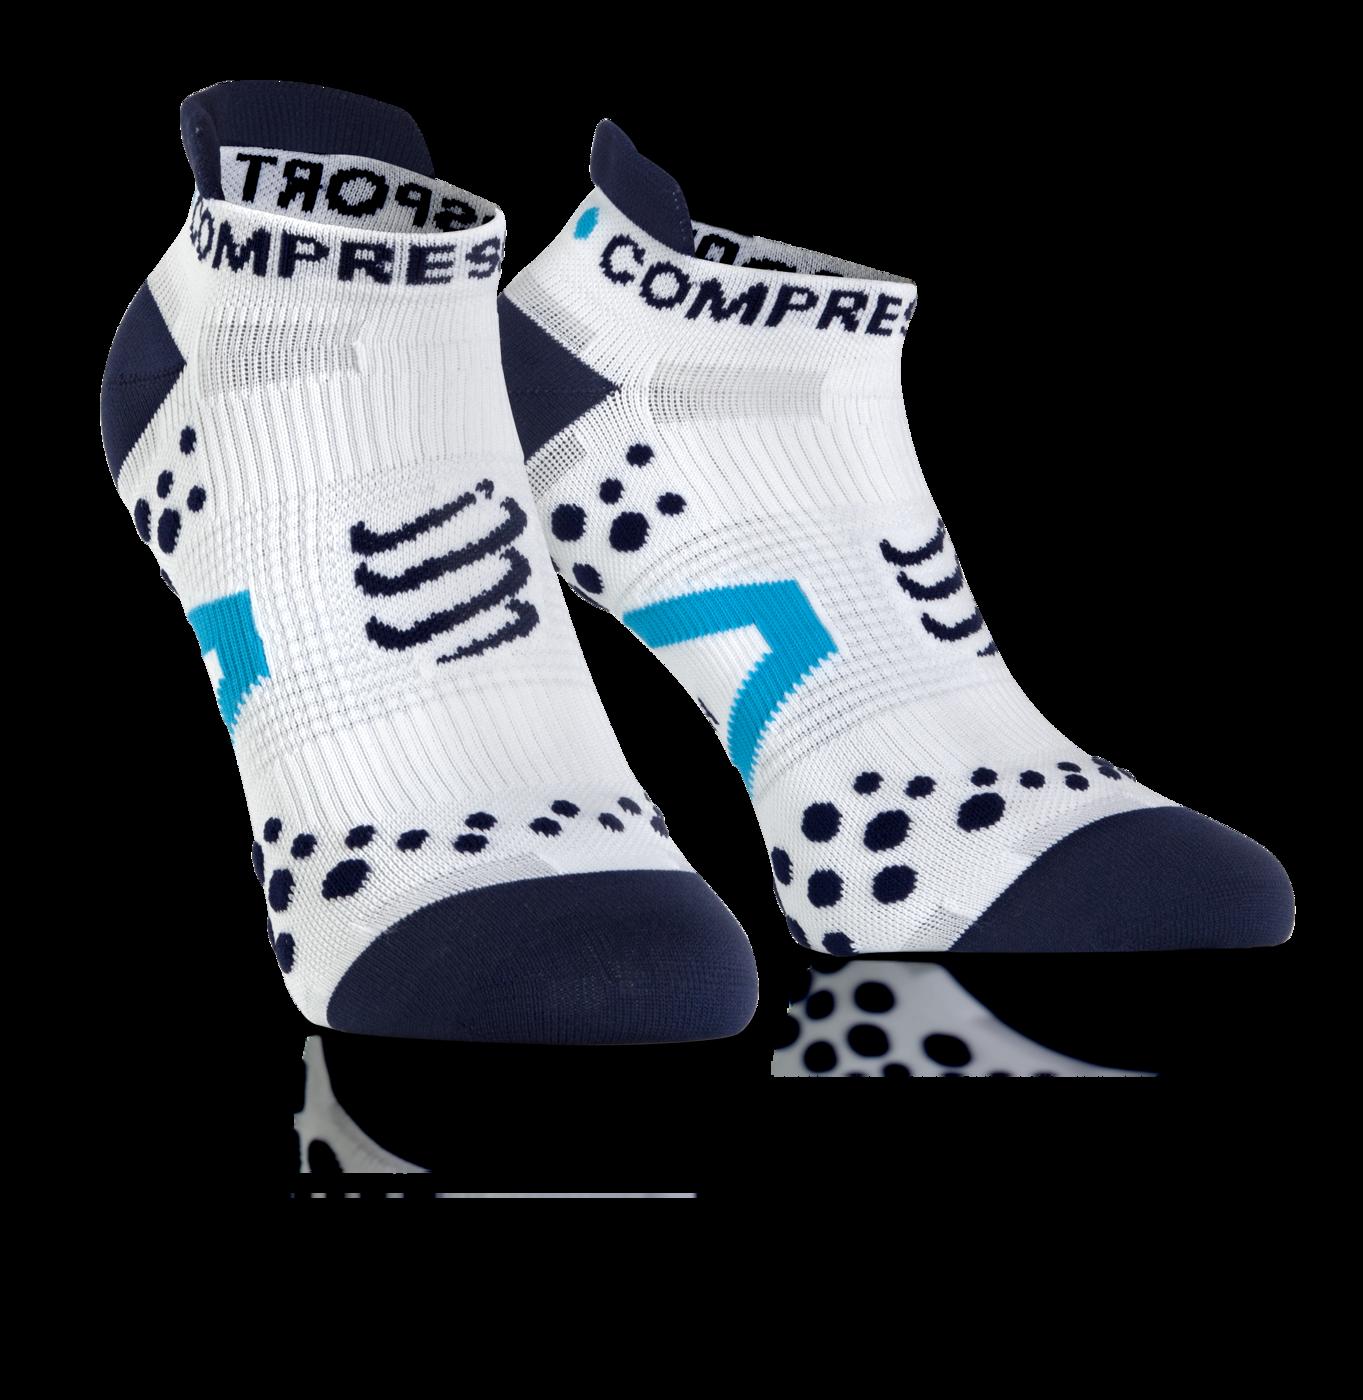 ProRacing Socks V2_1-RUN LOW-White-Blue